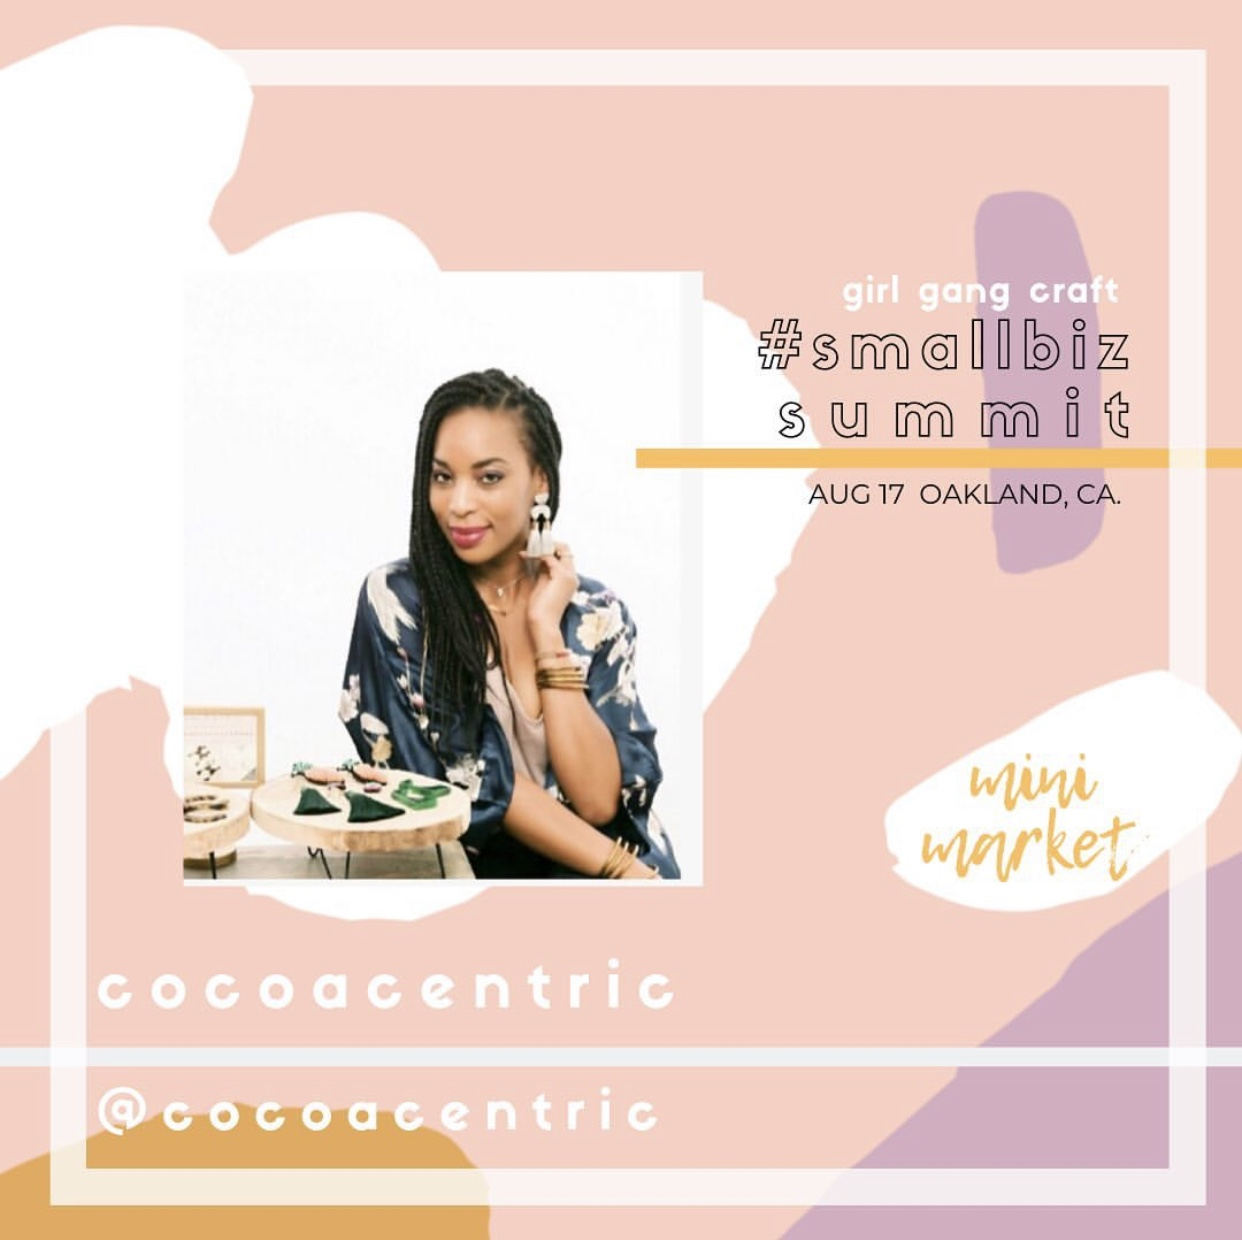 LATOYA Mc INNIS: - DESIGNER + FOUNDER@cocoacentric